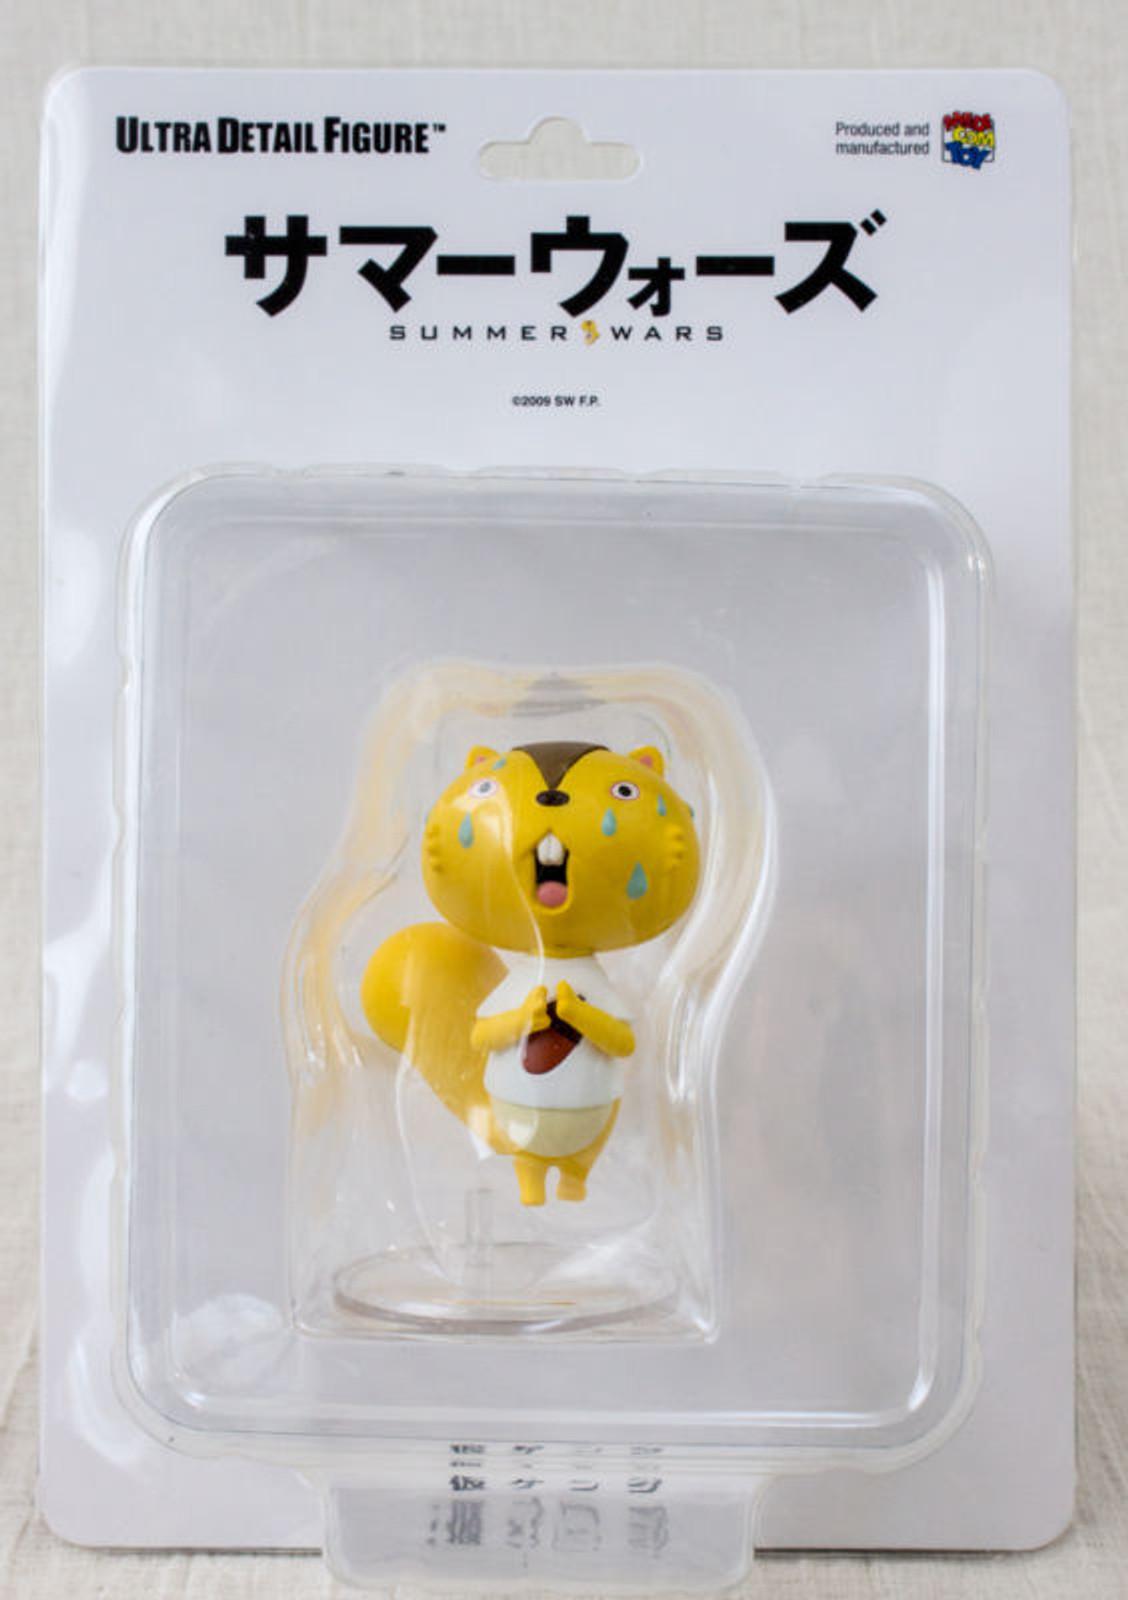 Summer Wars Provisional Kenji Ultra Detail Figure UDF Medicom Toy JAPAN ANIME